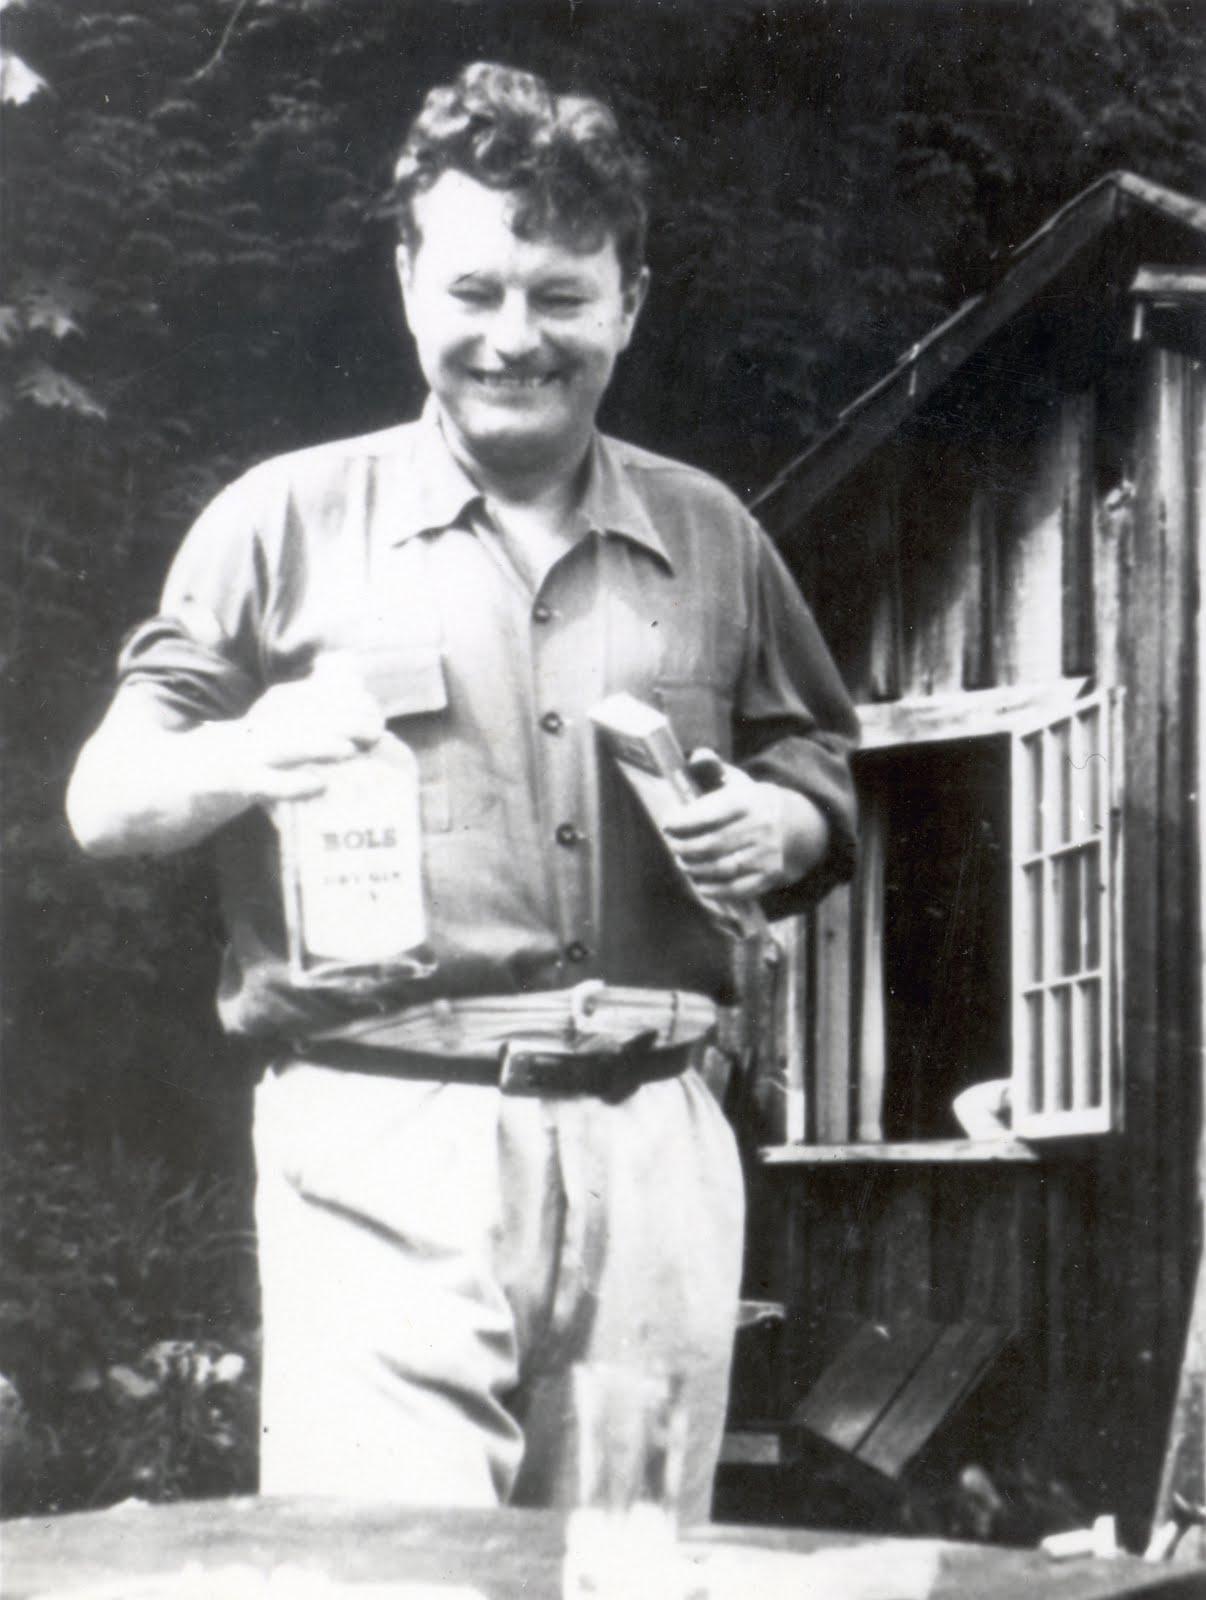 Malcolm Lowry (Birkenhead, 1909 – Ripe, 27 giugno 1957) - © https://www.reddit.com